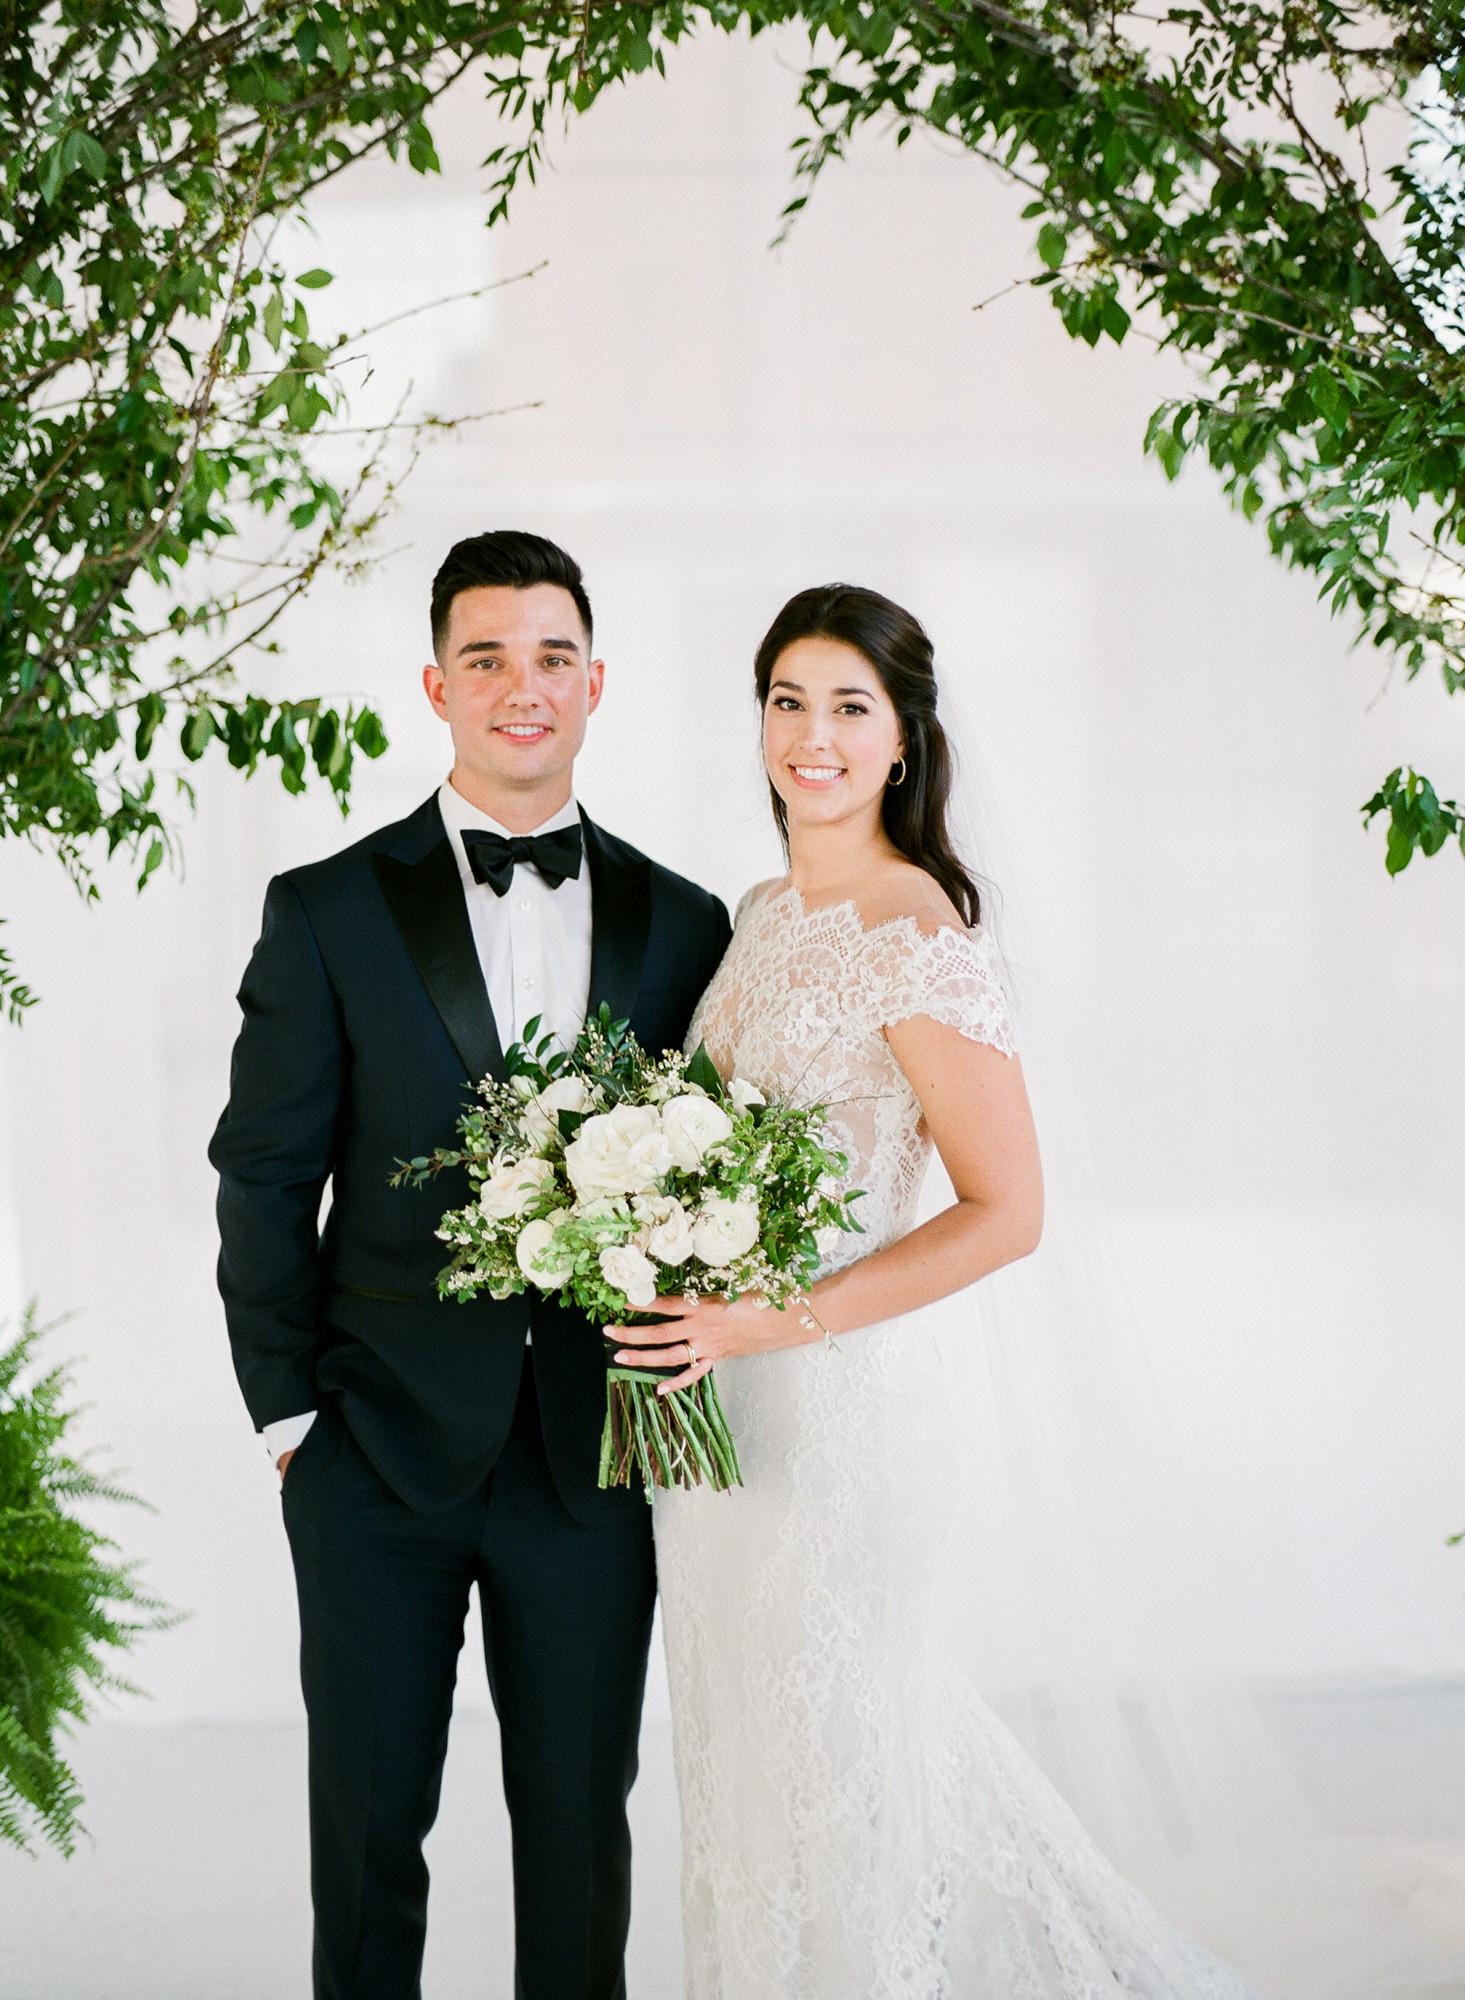 wedding bride groom pose under greenery arch